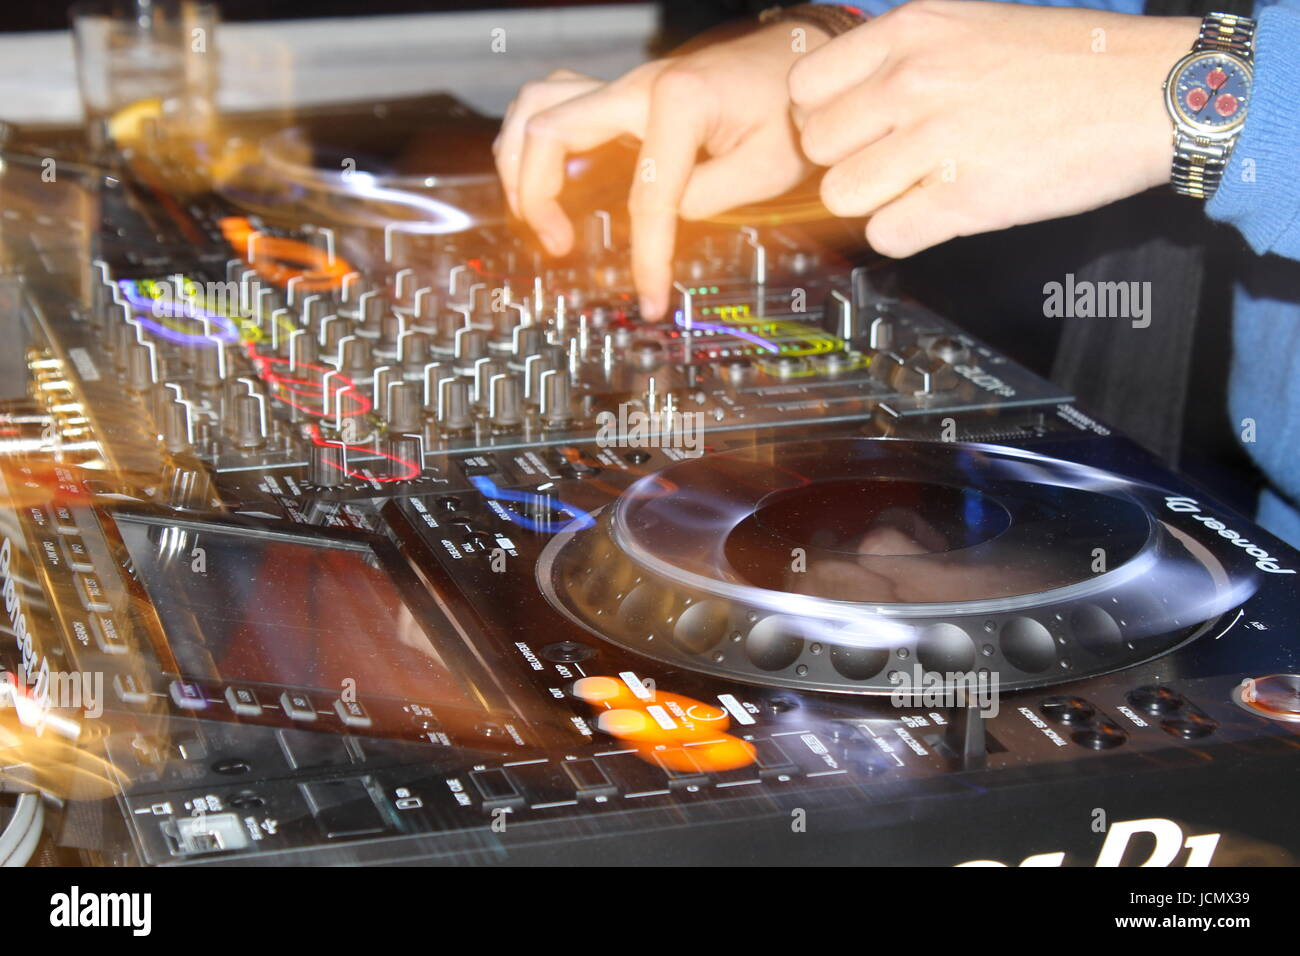 Close up of a DJ playing with CDJs and a mixer - Stock Image